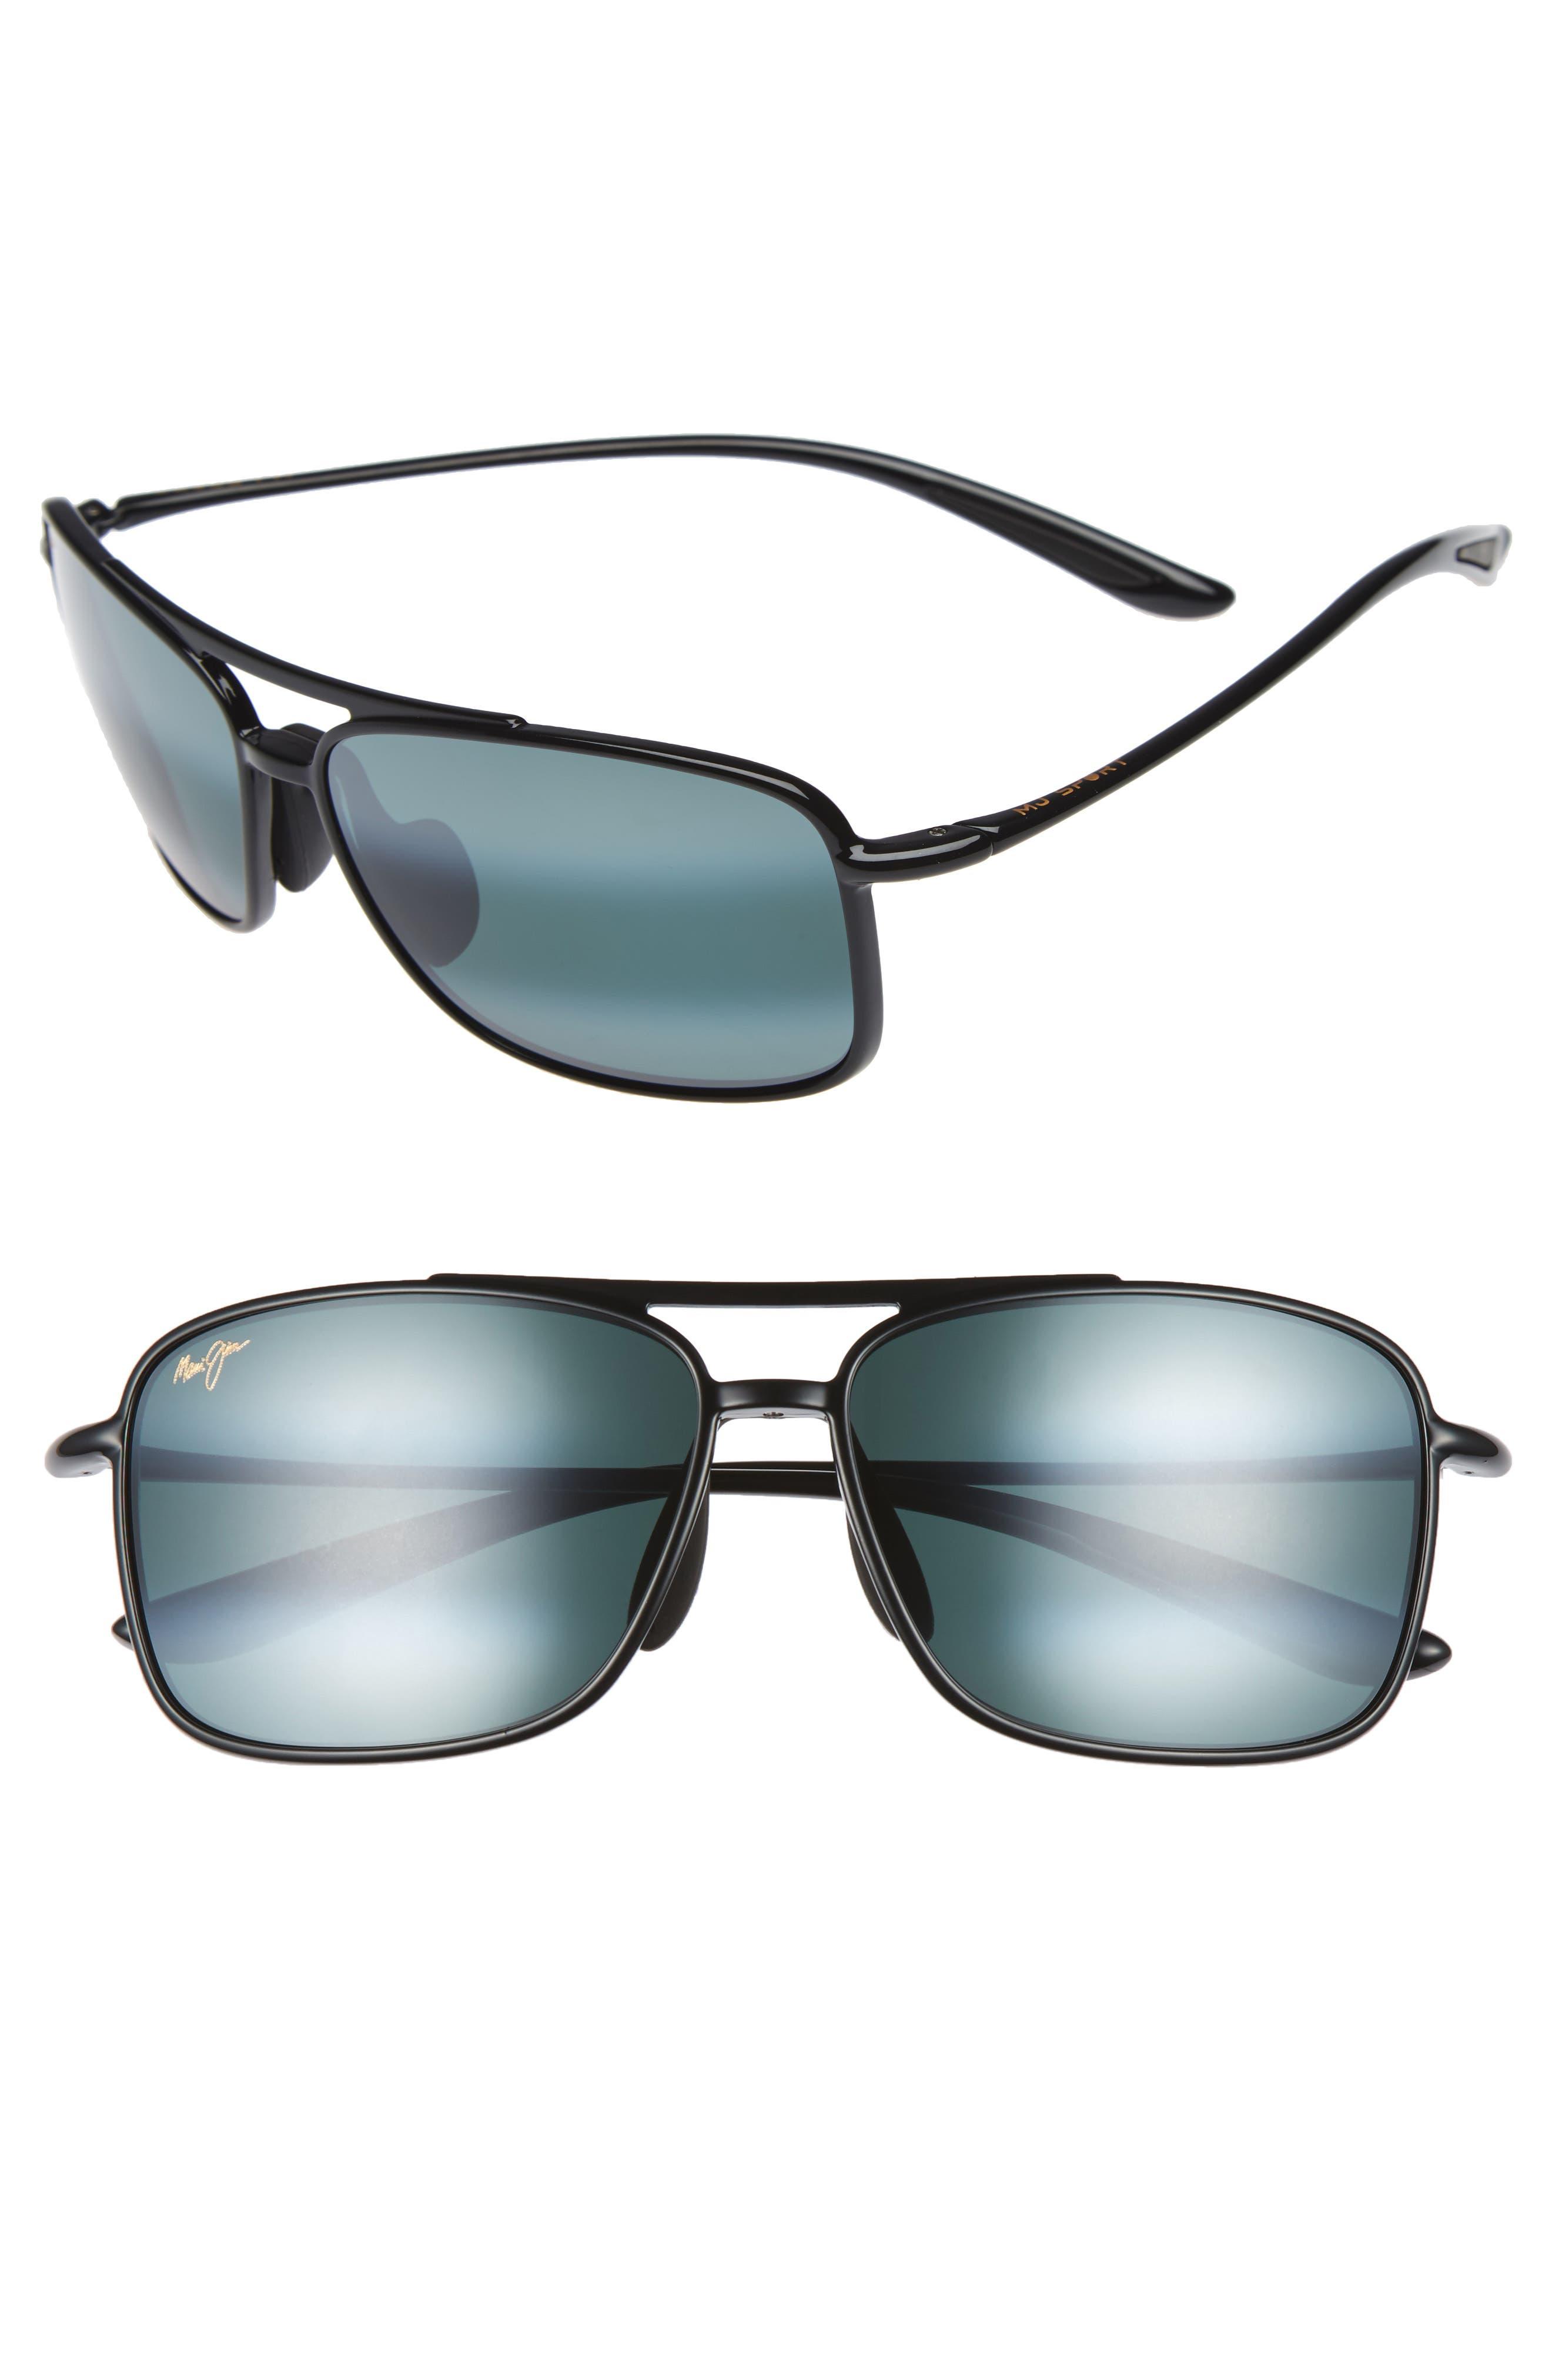 Maui Jim Kaupo Gap 61Mm Polarizedplus2 Sunglasses - Gloss Black/ Neutral Grey